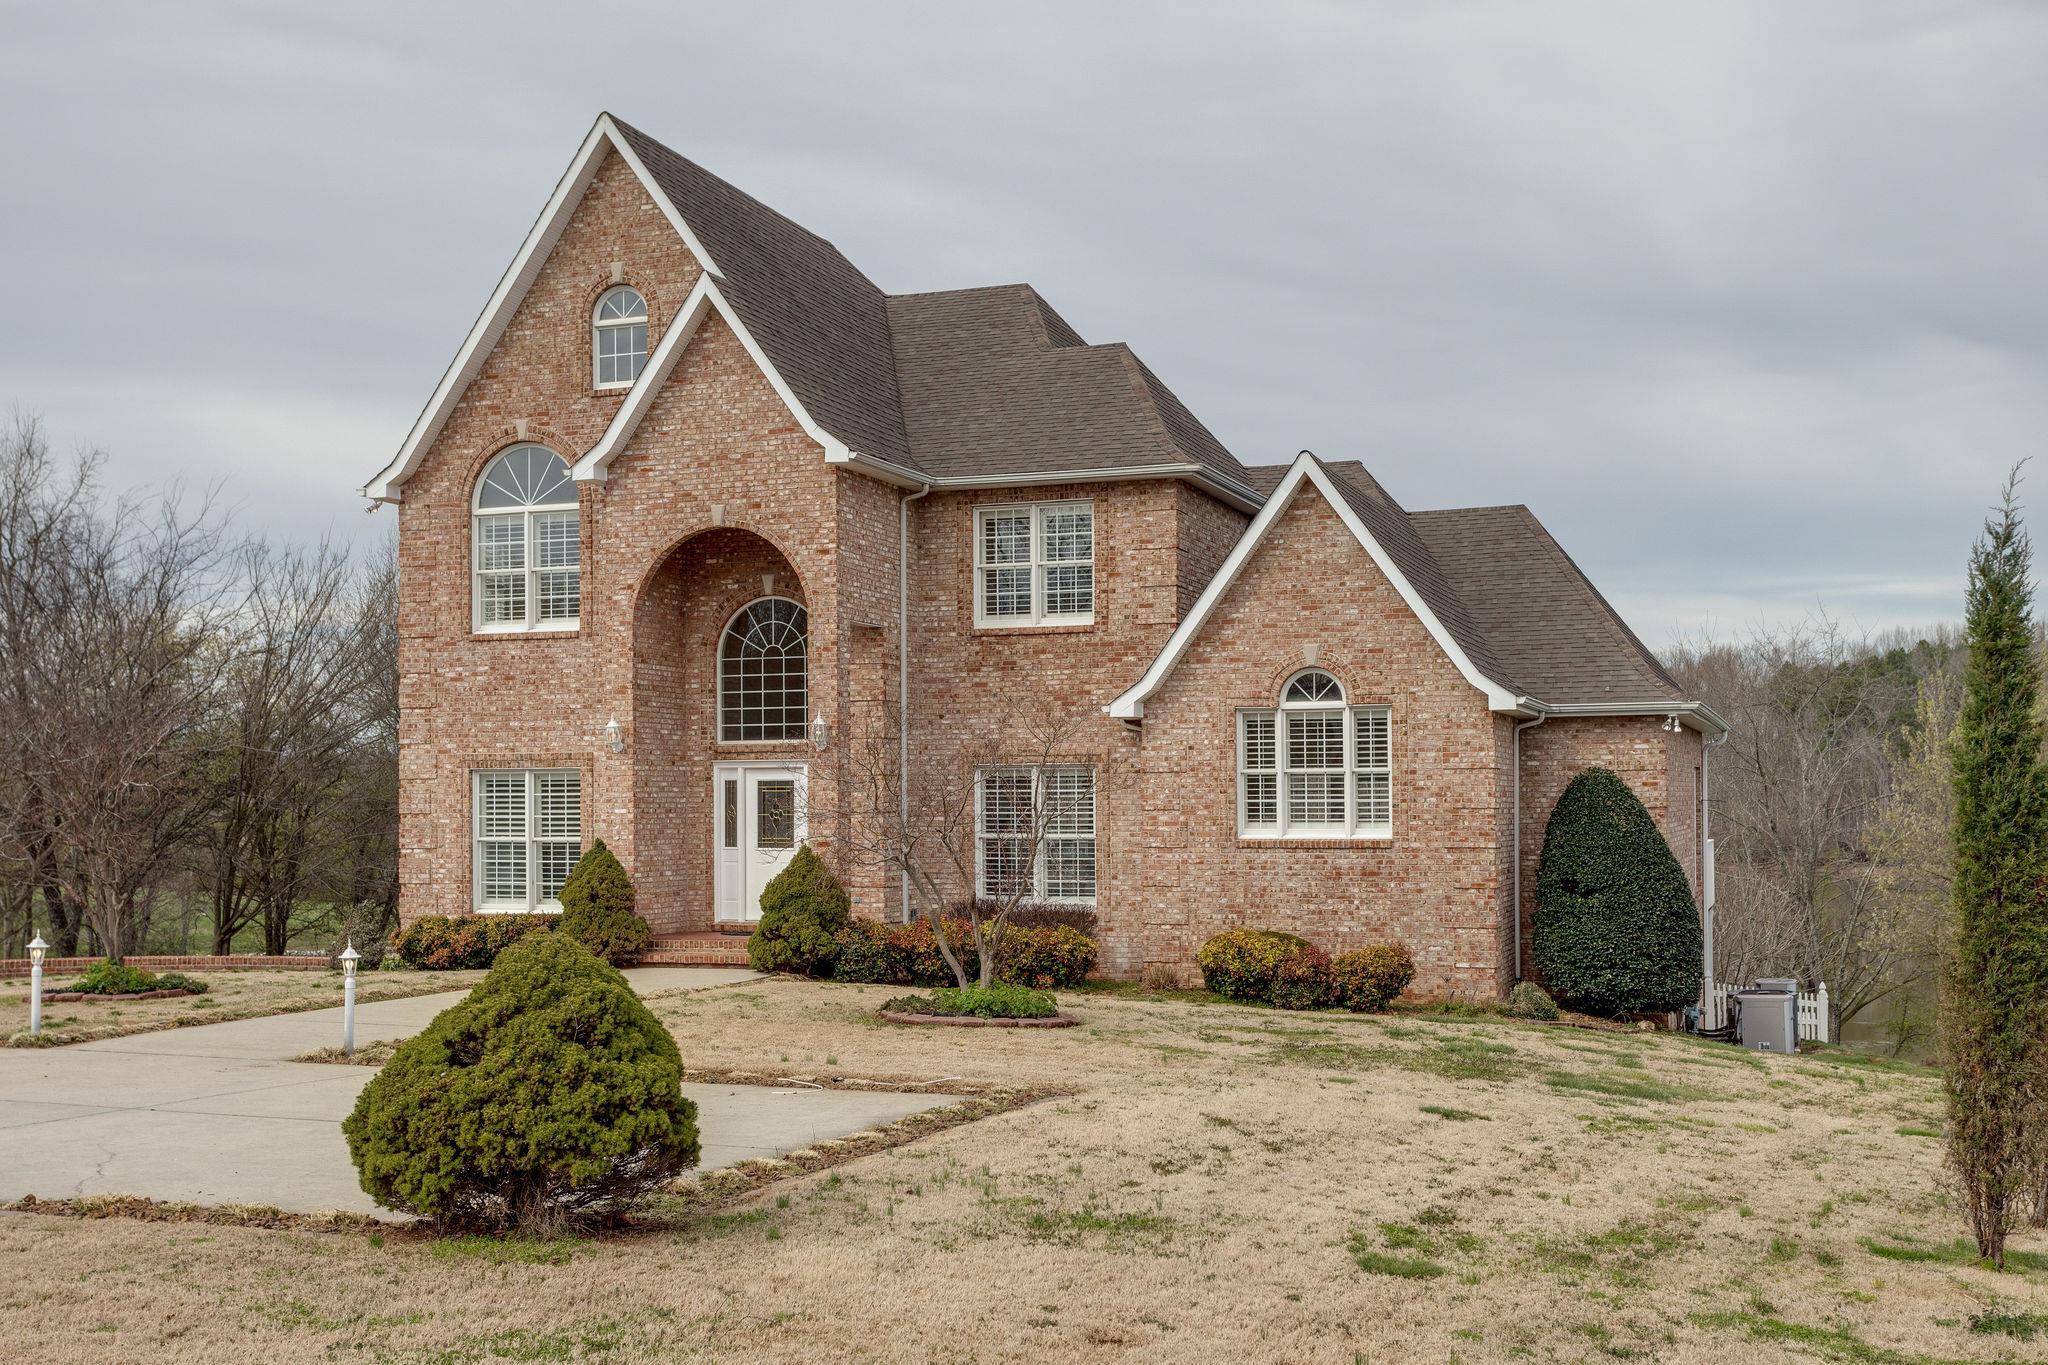 532 Bryan Dr, Winchester, TN 37398 - Winchester, TN real estate listing